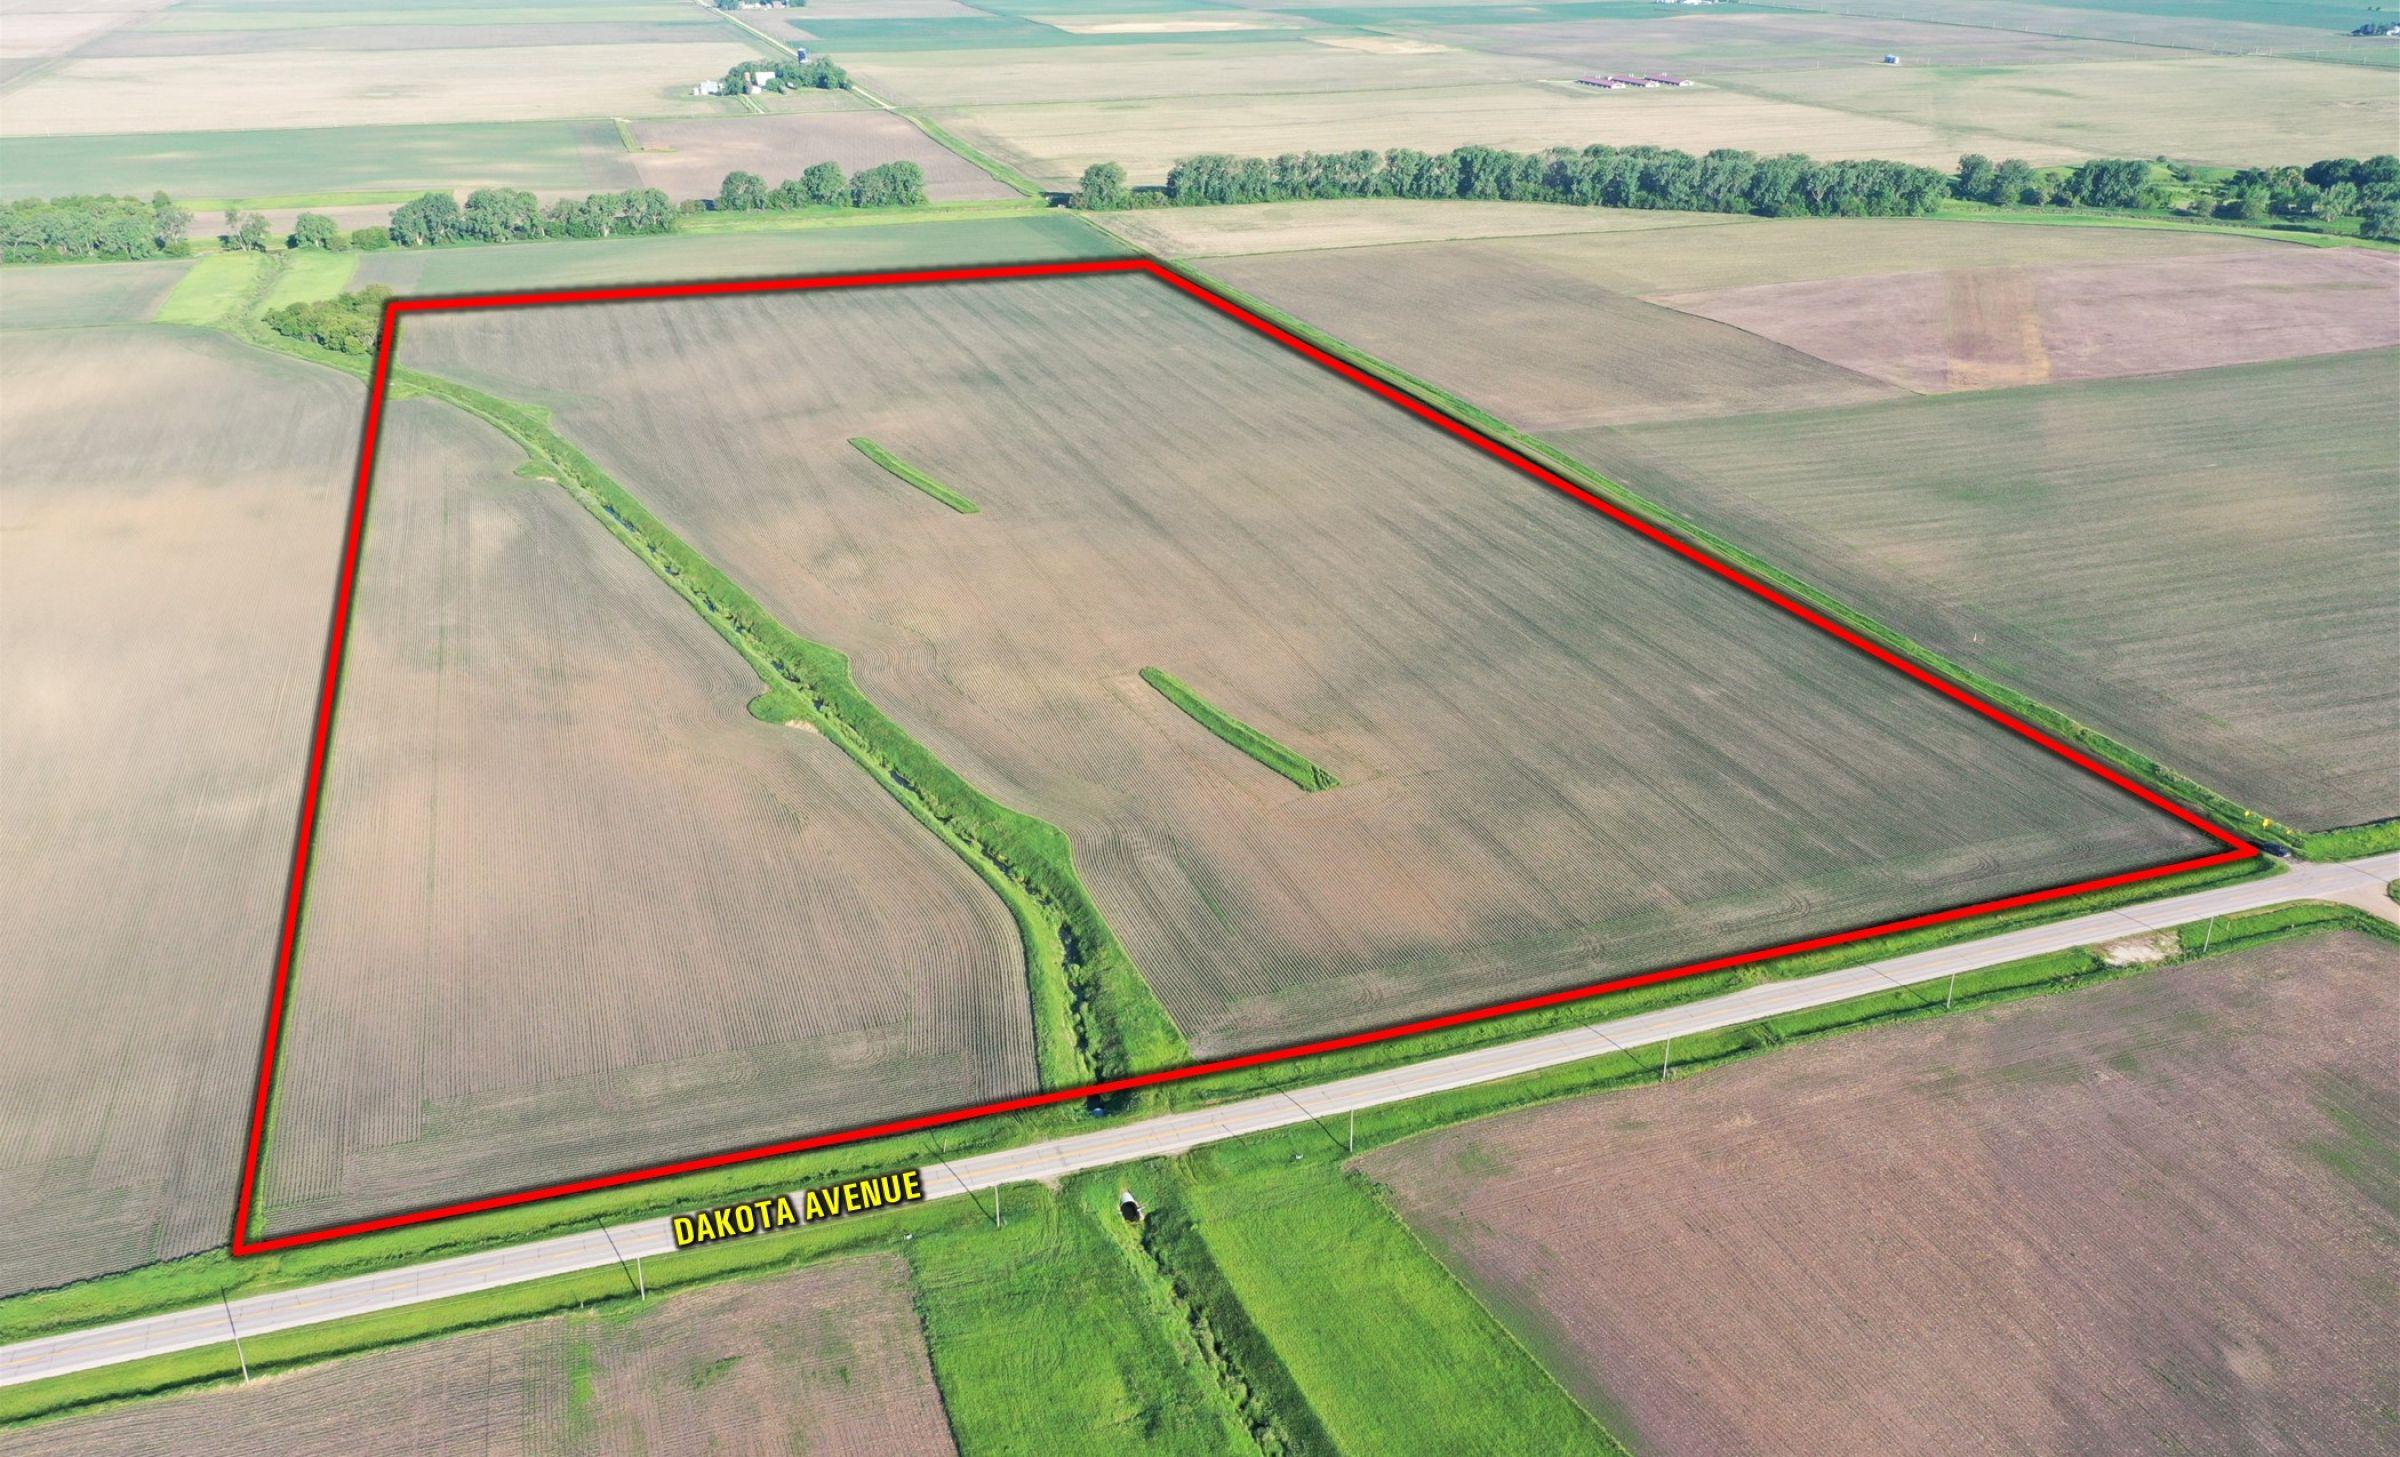 land-calhoun-county-iowa-80-acres-listing-number-15571-1-2021-06-09-180555.jpg